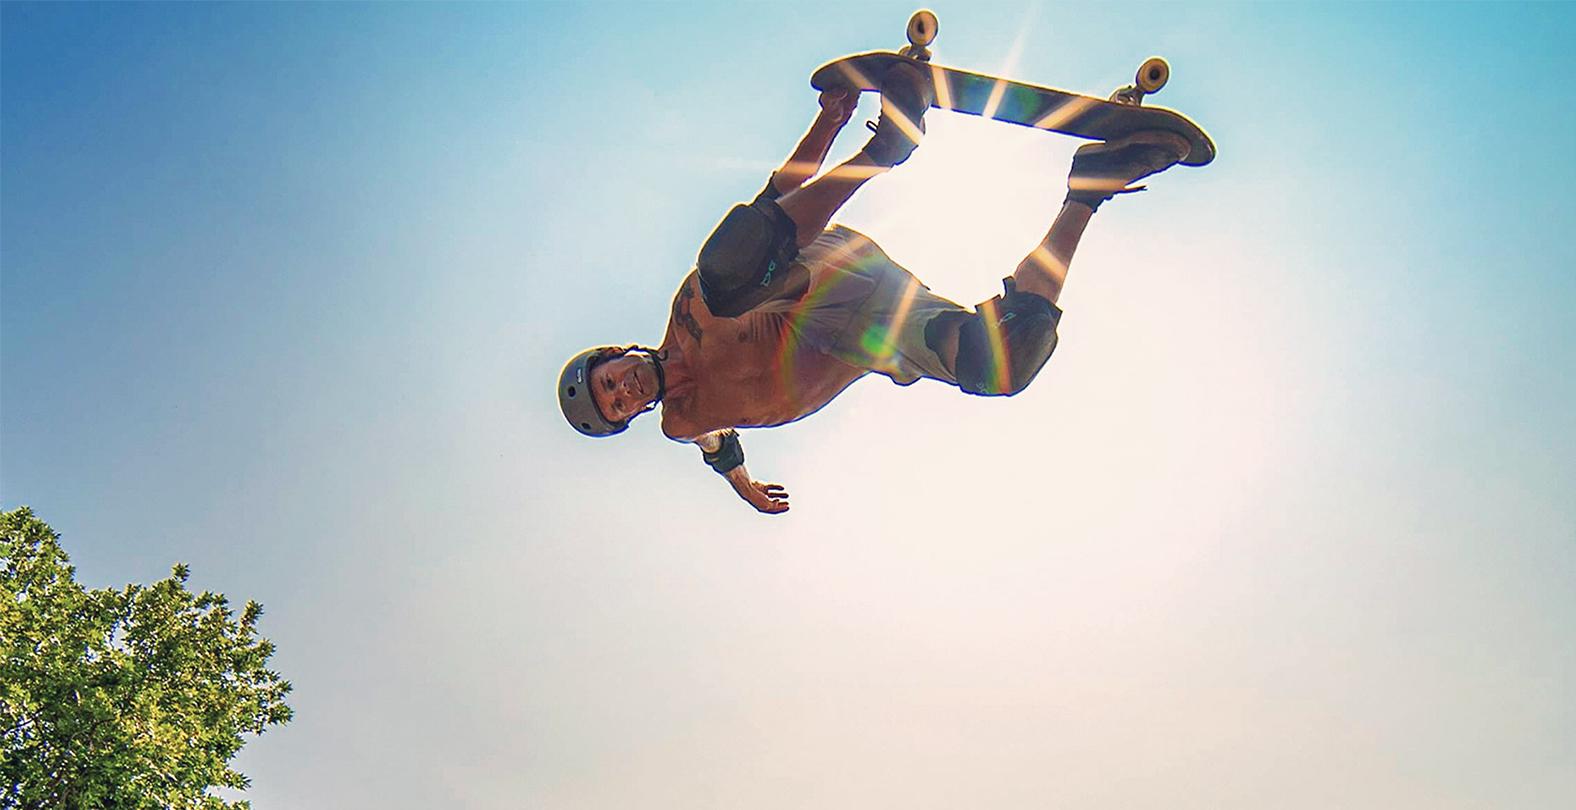 skateboarder in the air tsg team rider Renton Millar